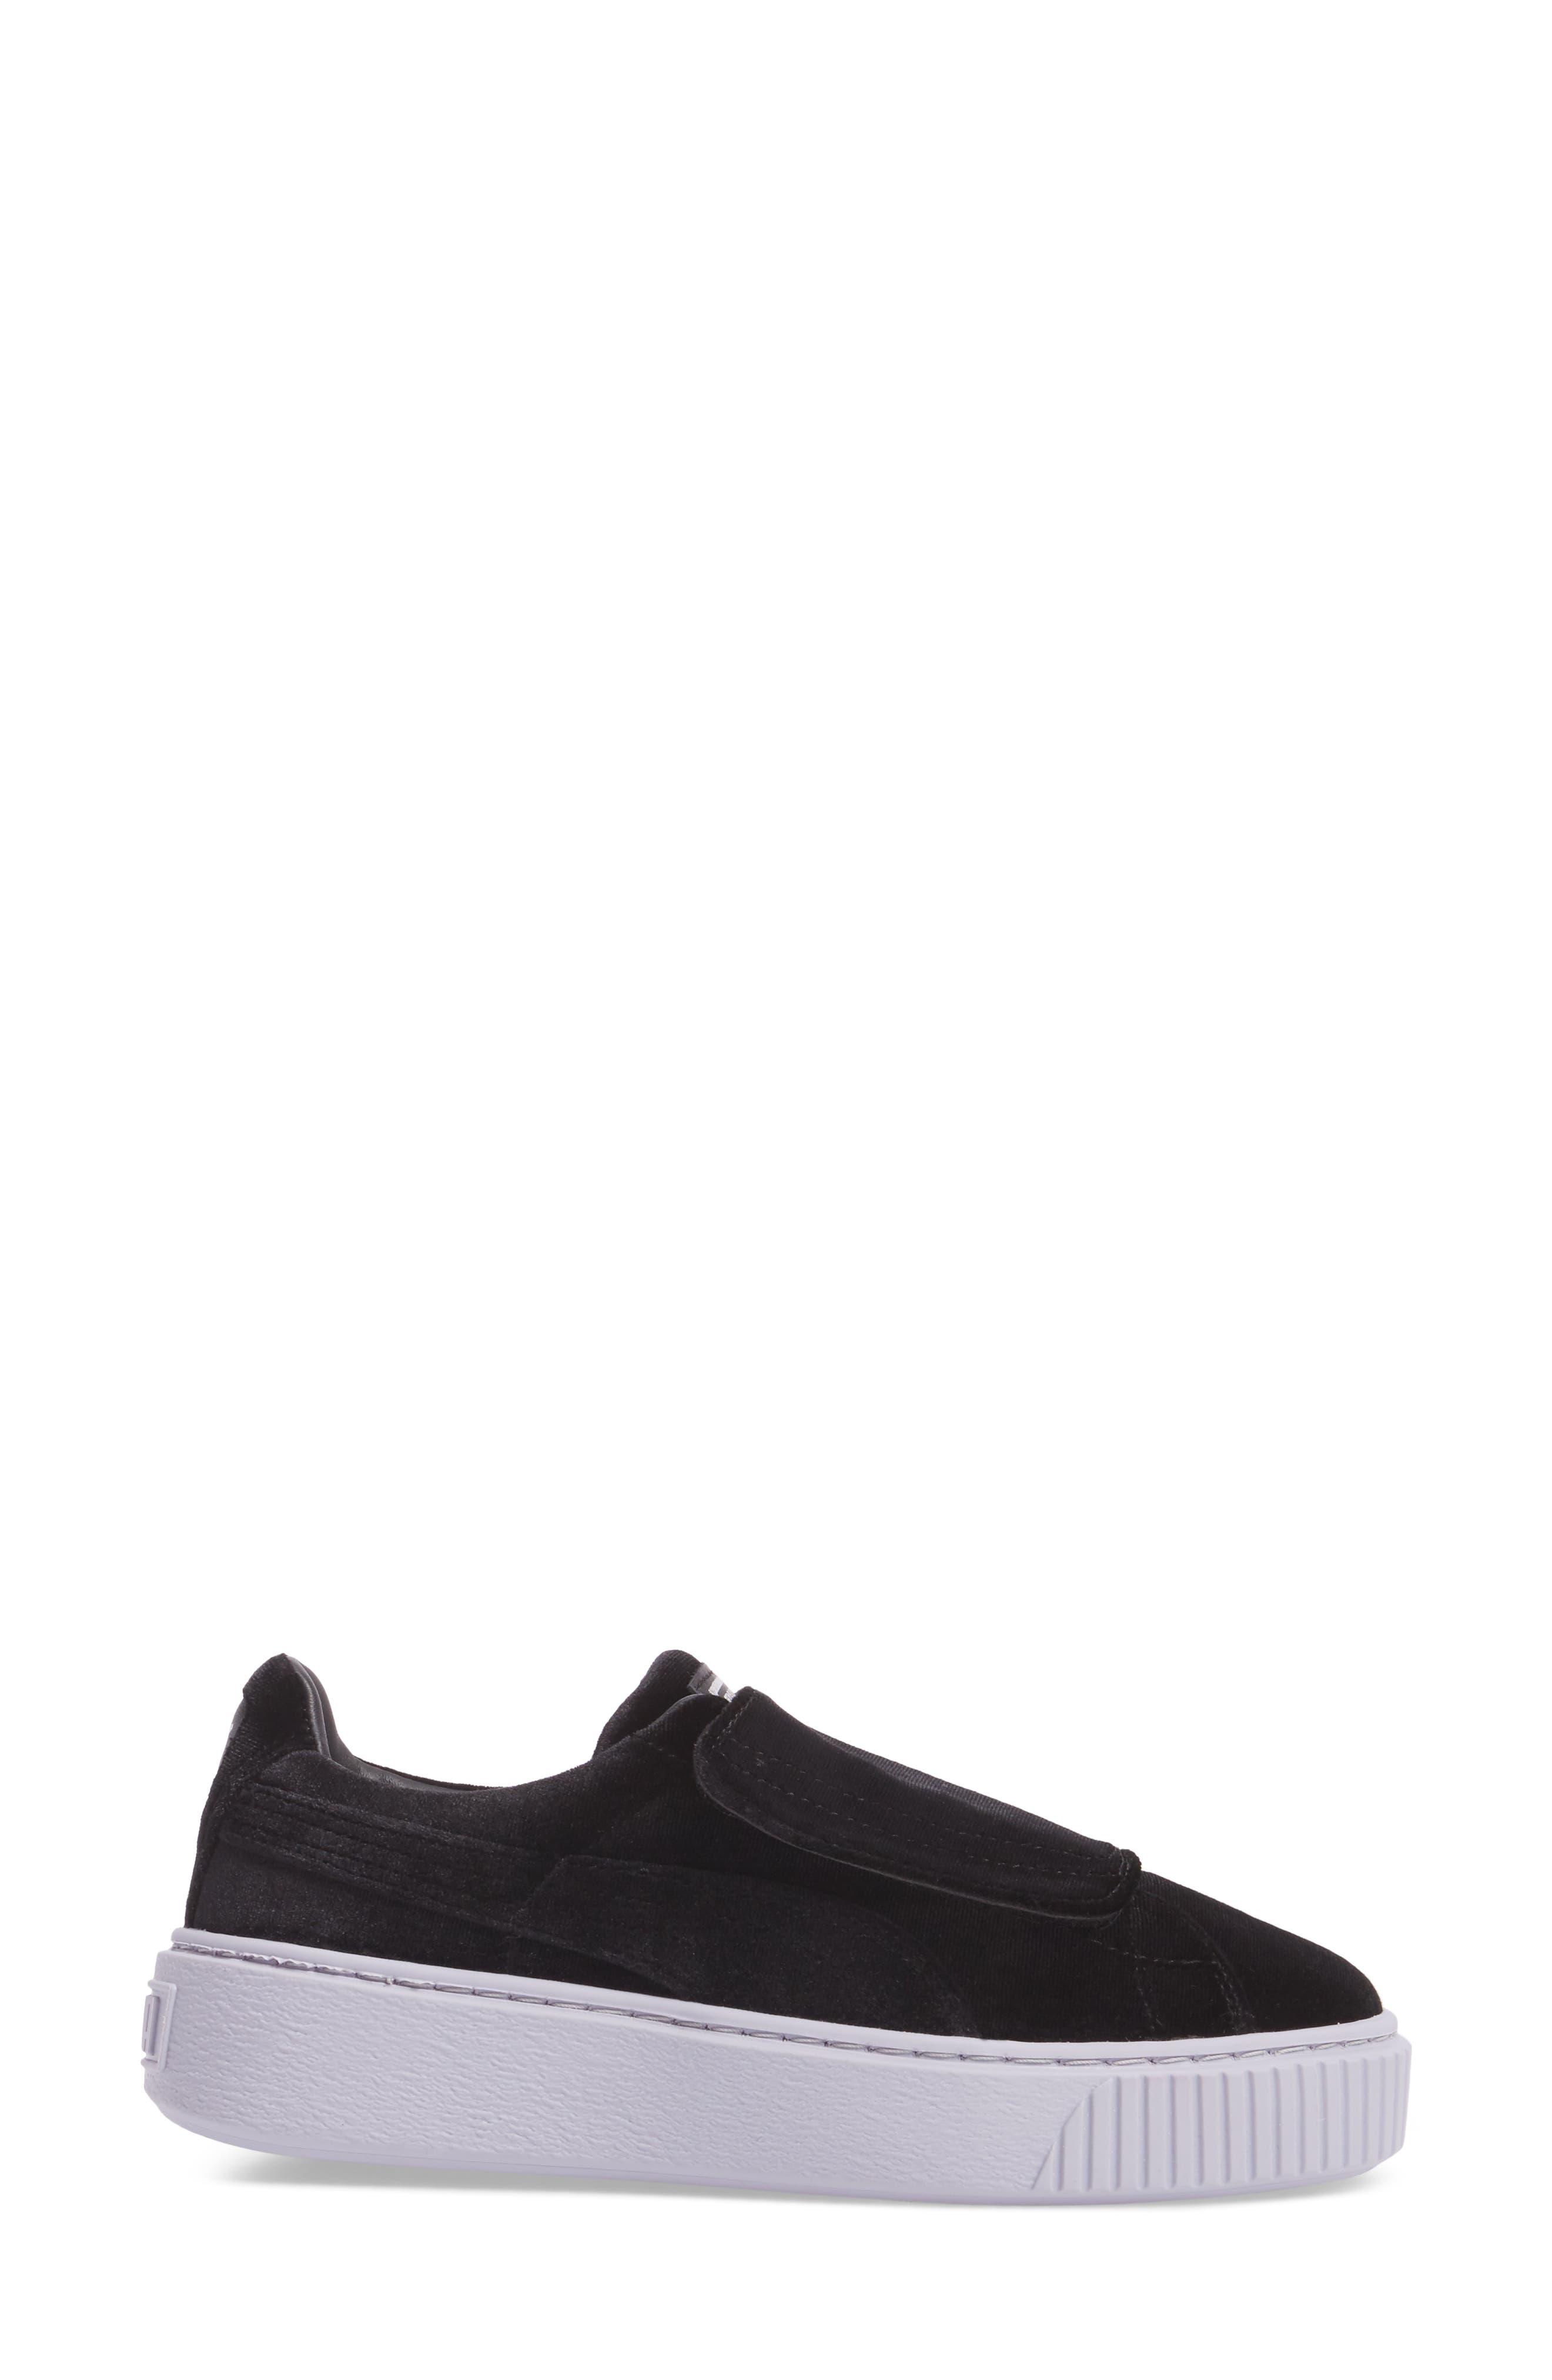 Basket Platform Sneaker,                             Alternate thumbnail 3, color,                             002